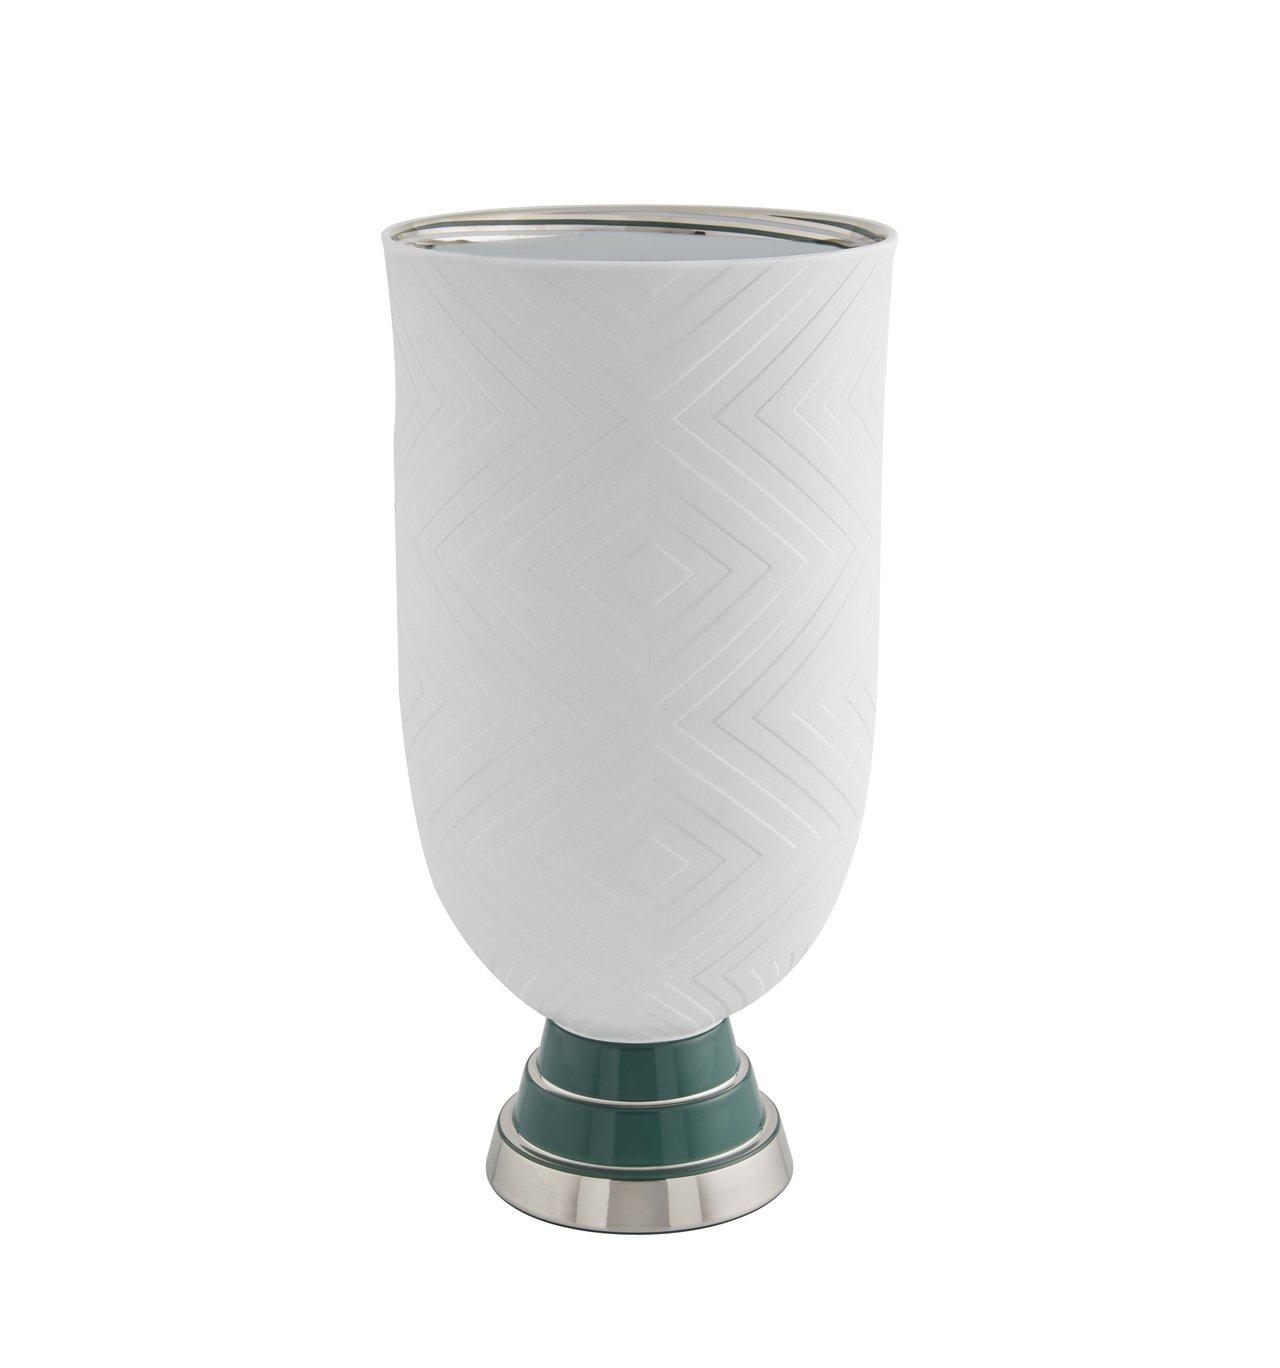 VISTA ALEGRE - Lavish (Ref # 21122122) Vase by VISTA ALEGRE - Lavish (Ref # 21122122) Vase